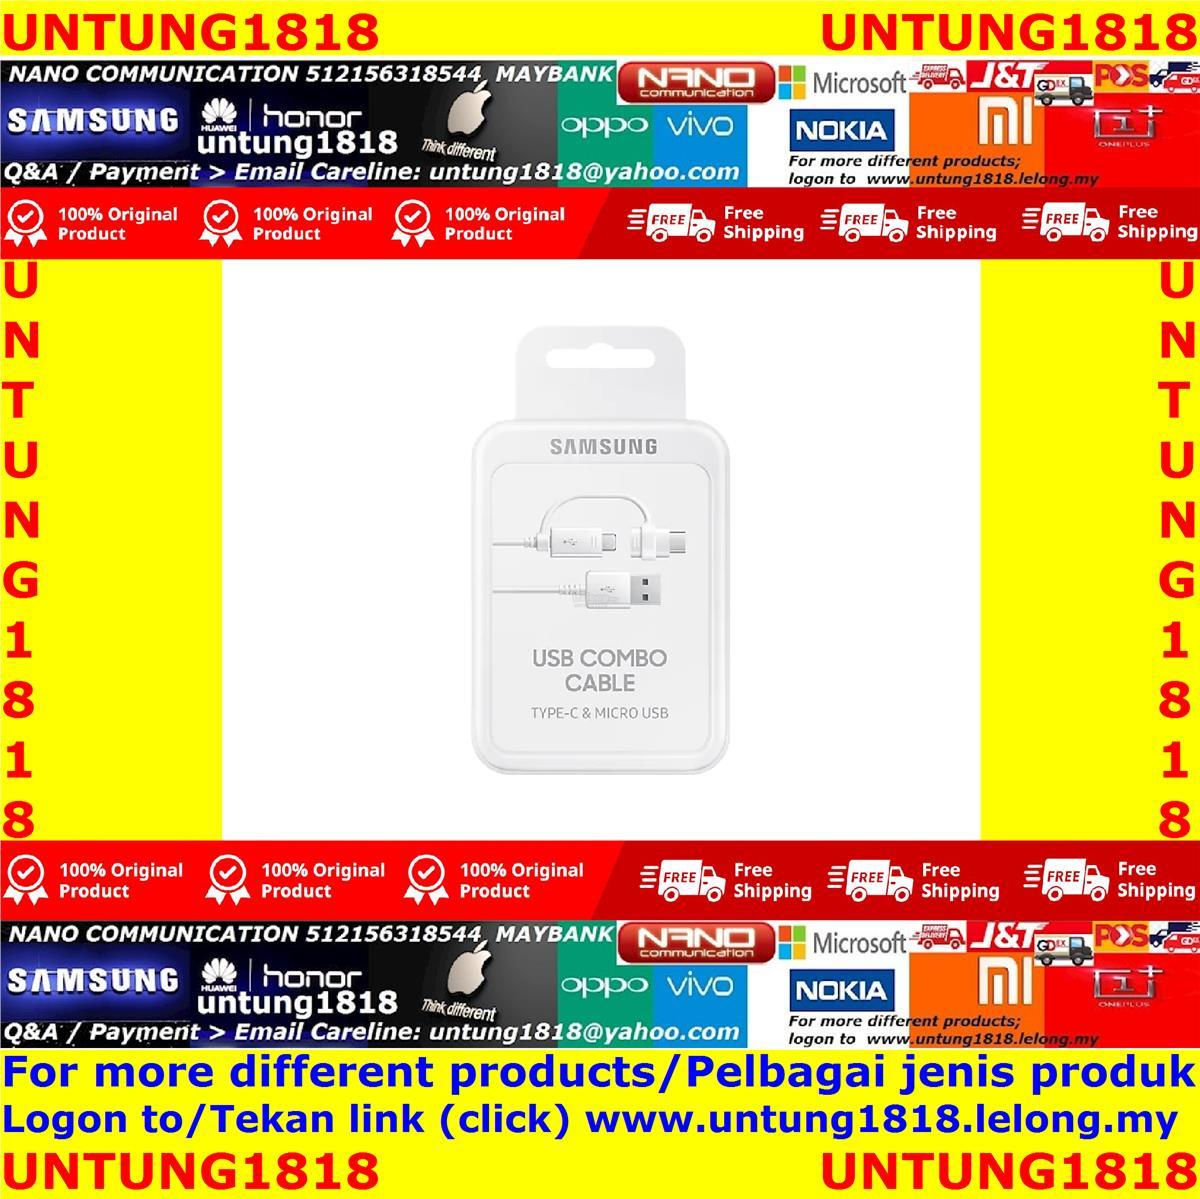 Ori M'sia Samsung.Samsung Smartphone Kit More Accessories Choice